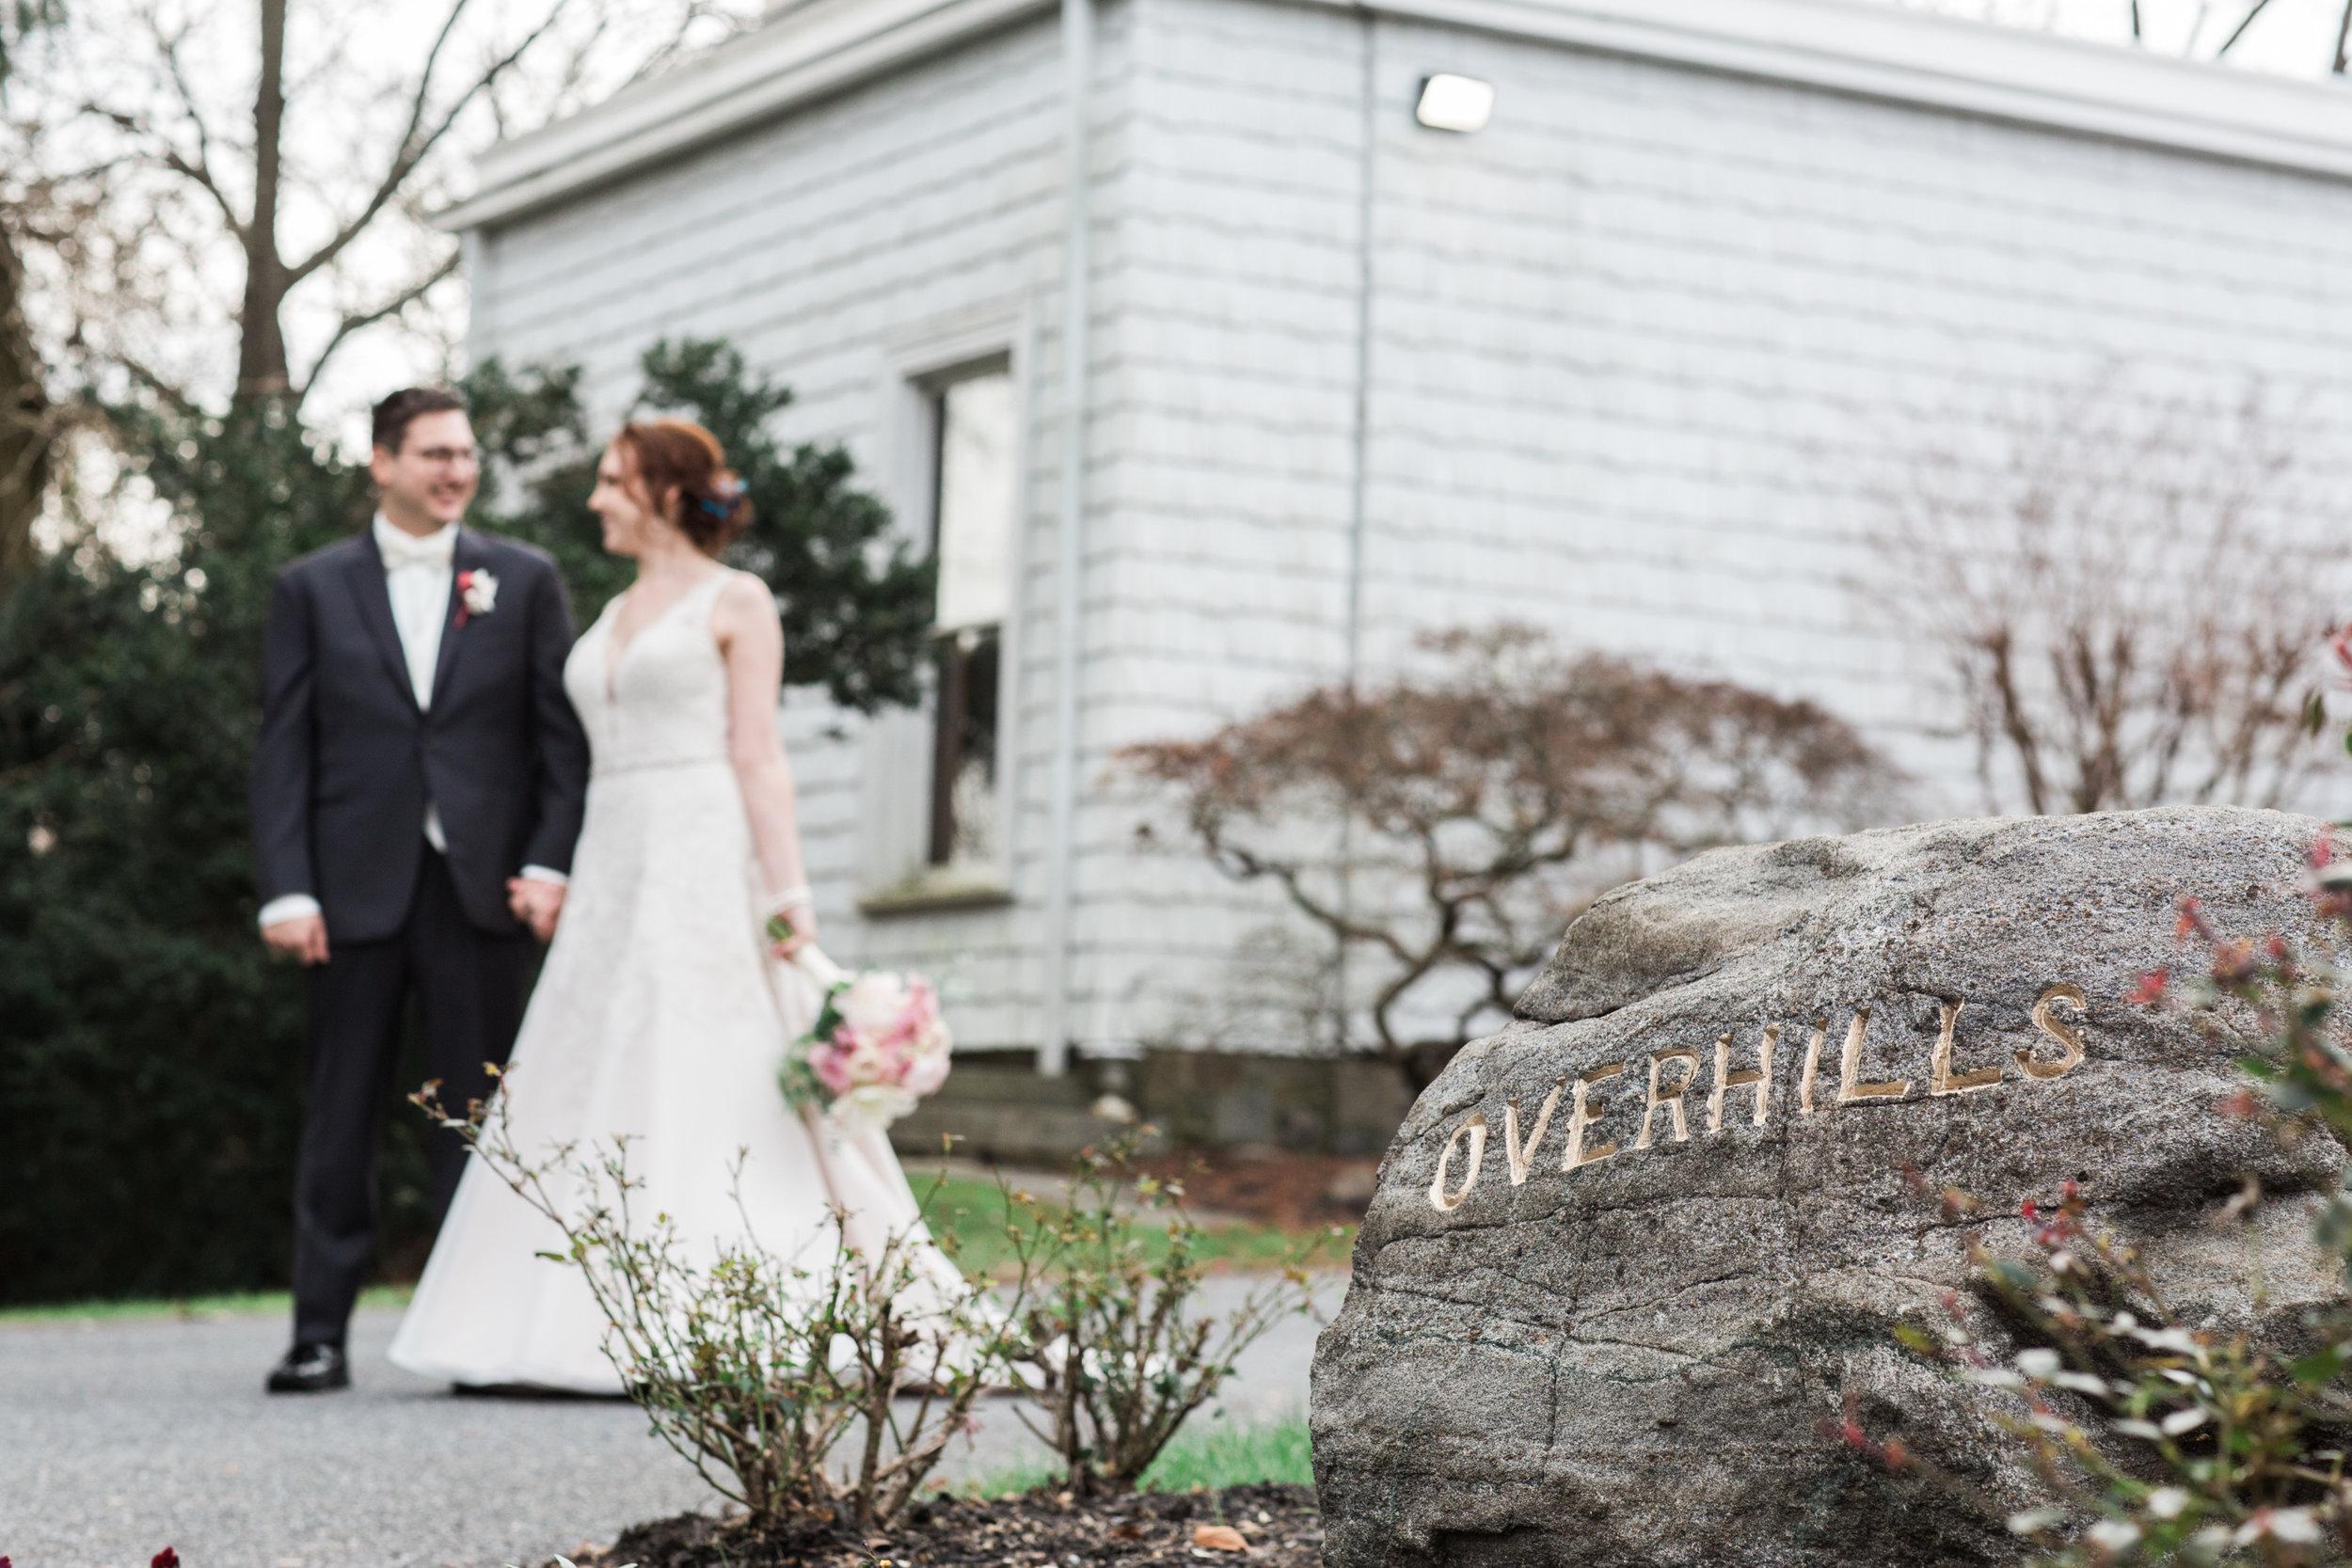 Harry Potter Wedding at Overhills Mansion Catonville Maryland Wedding Photographers Megapixels Media (40 of 134).jpg